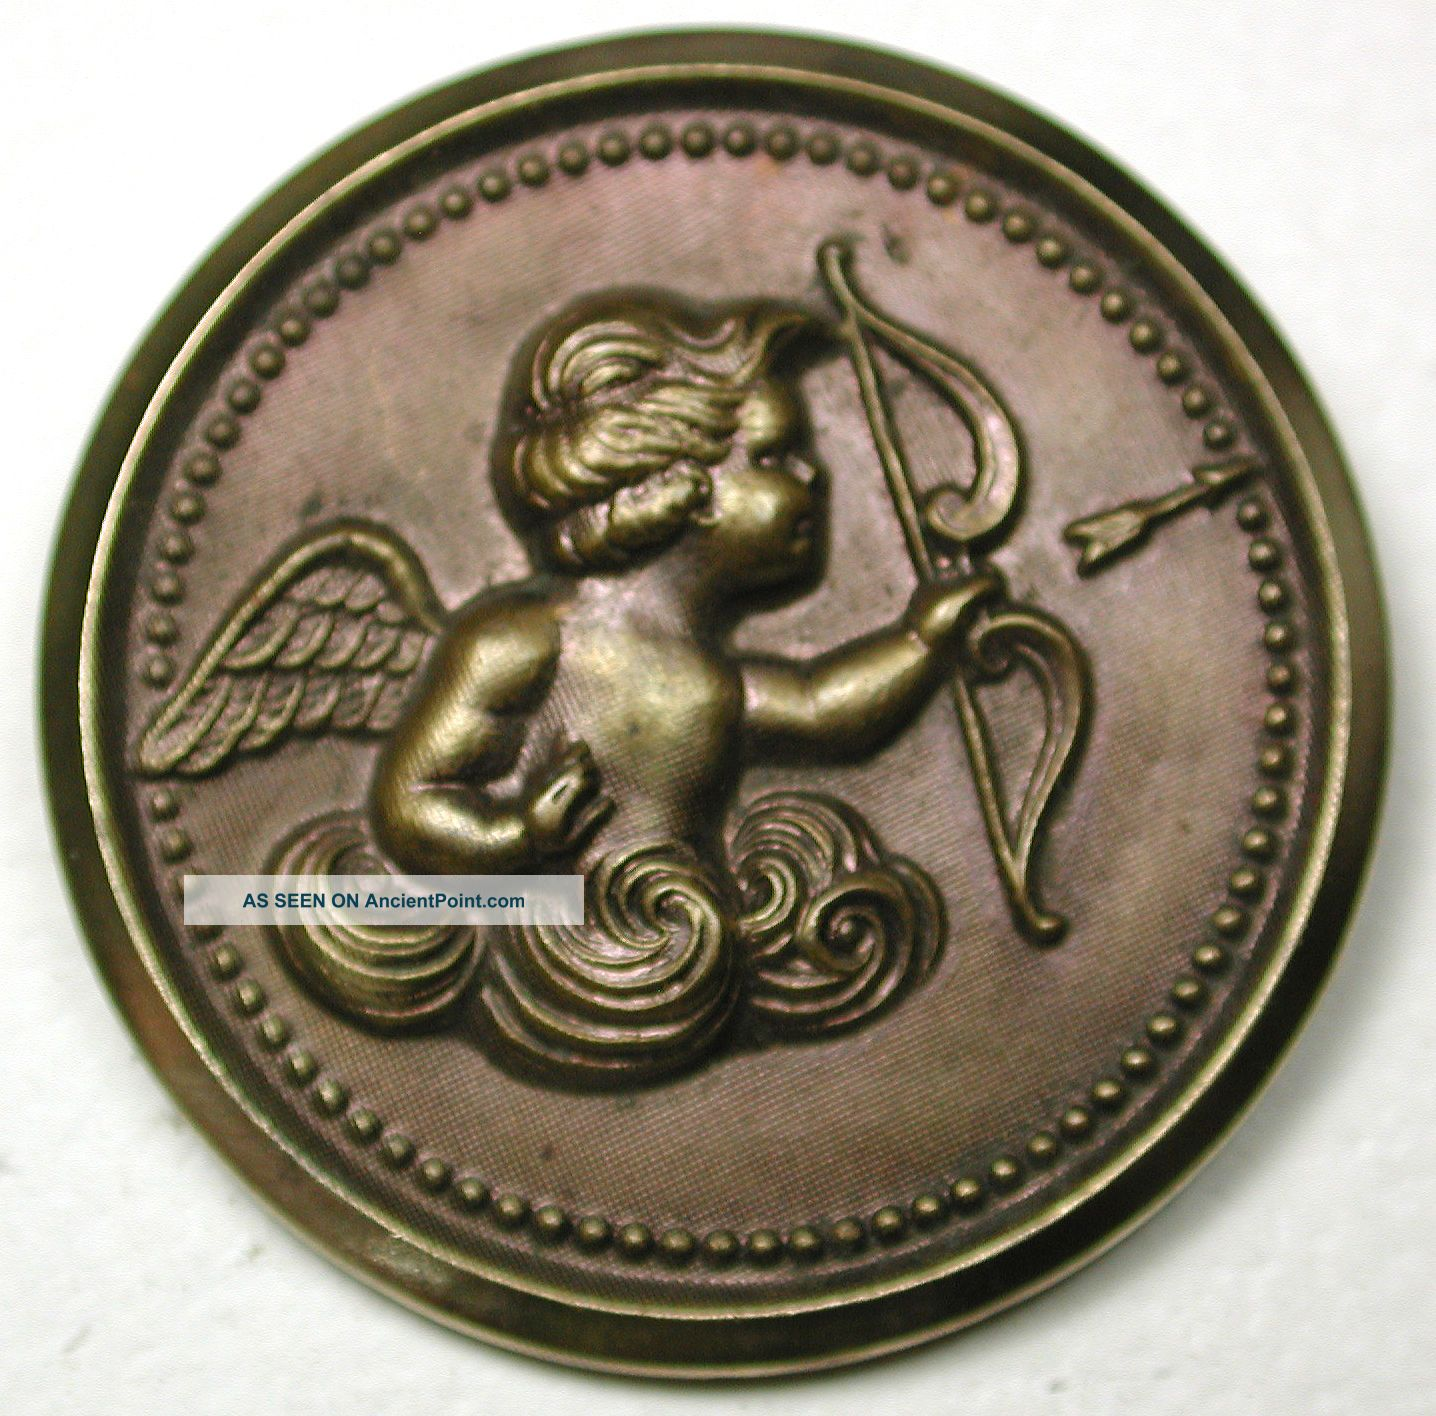 Lg Sz Antique Brass Button Cupid Shooting An Arrow Image - 1 & 1/2